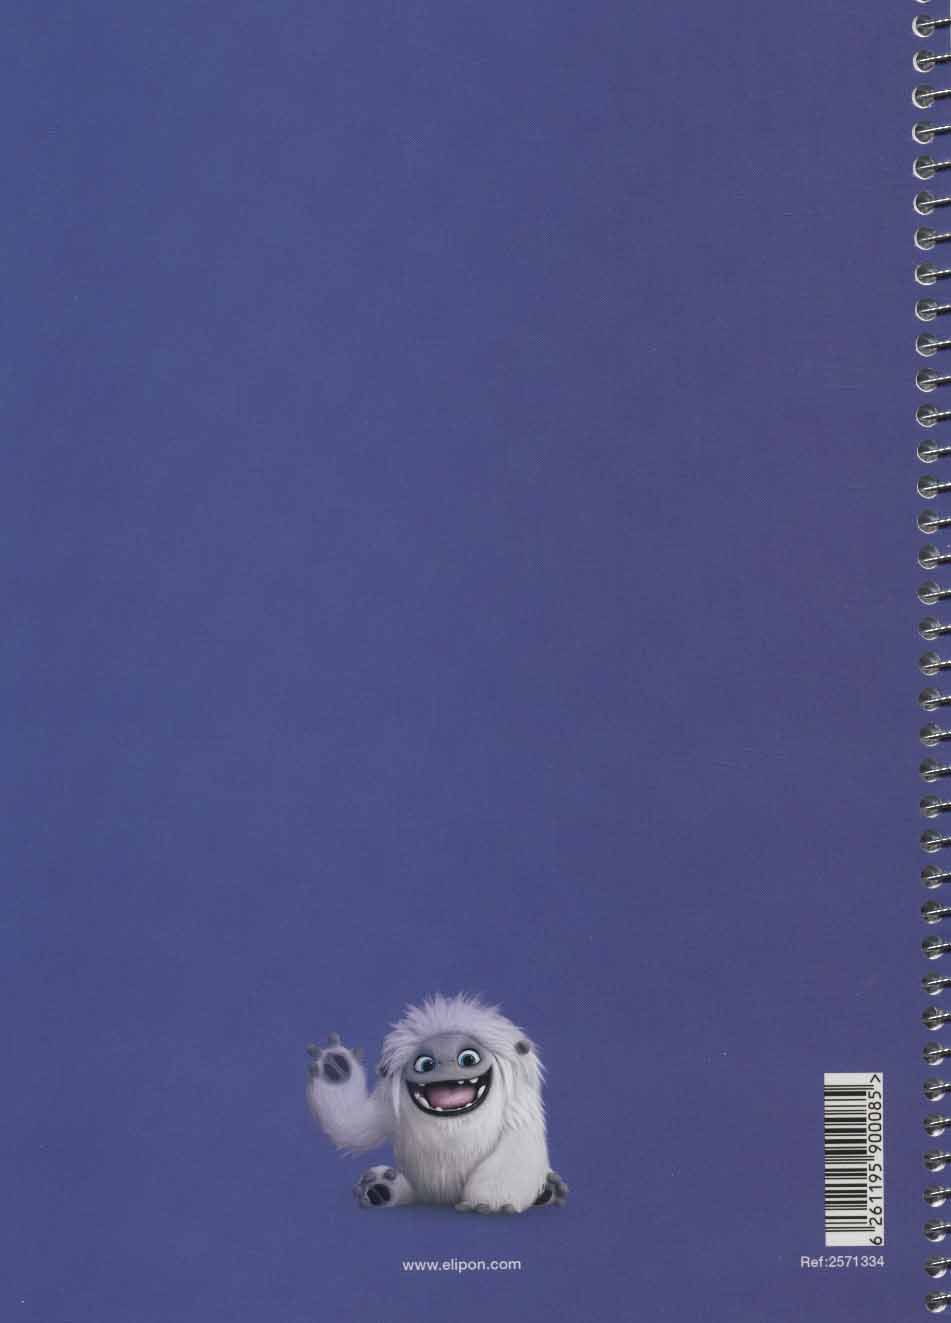 دفتر یادداشت زبان انگلیسی کارتونی (40برگ،2خط)،(2طرح،کد 257)،(سیمی)